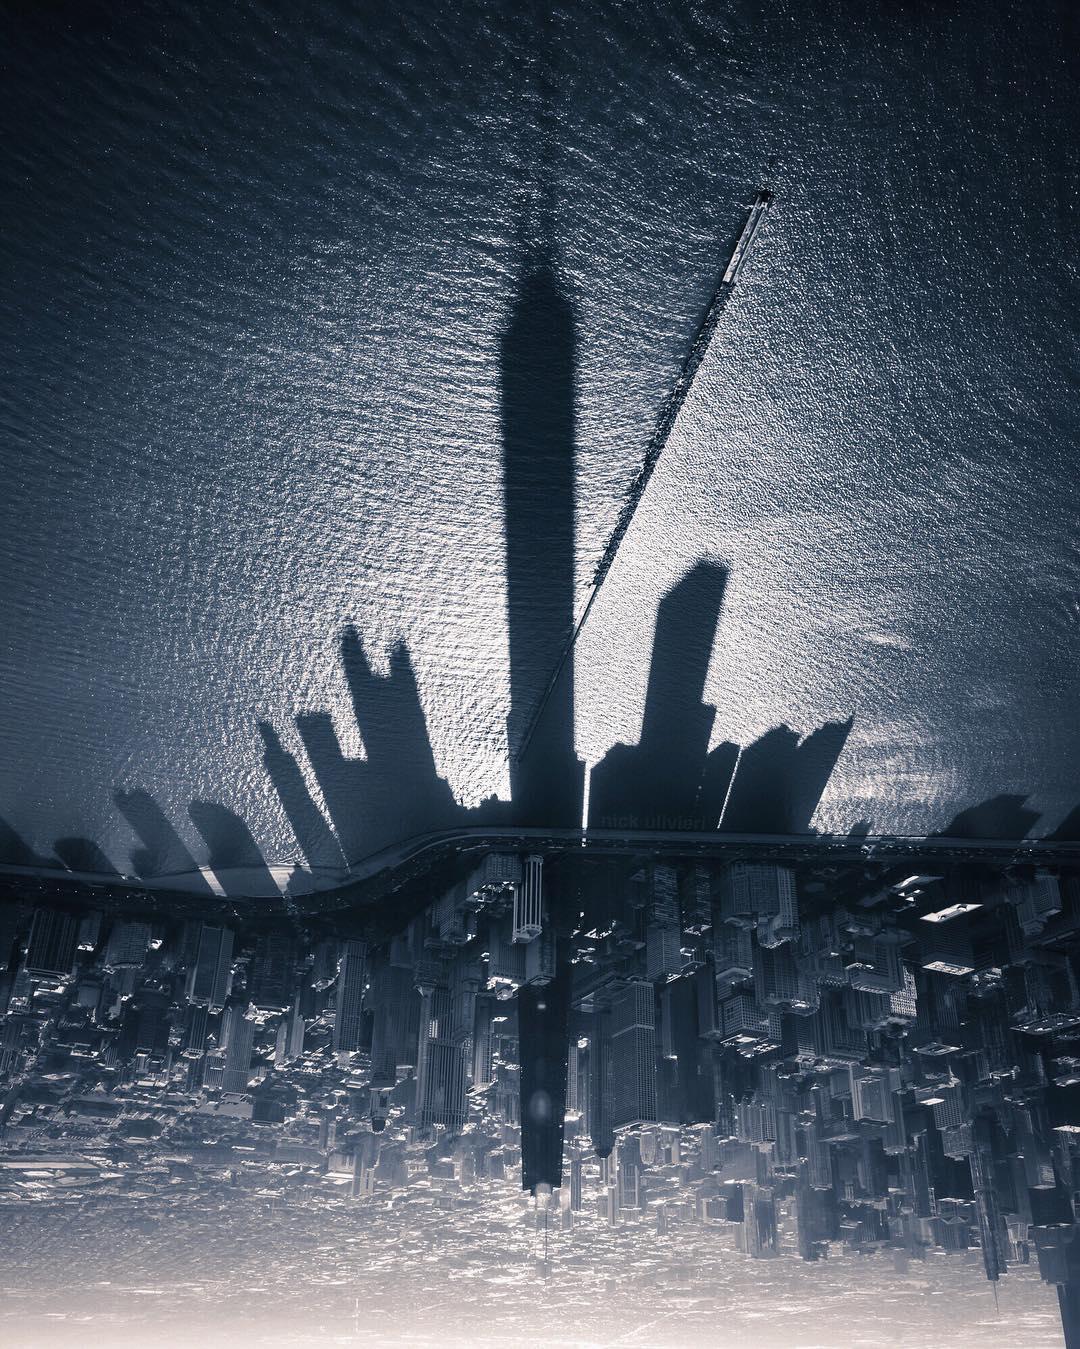 Чикаго на снимках Ника Уливьери